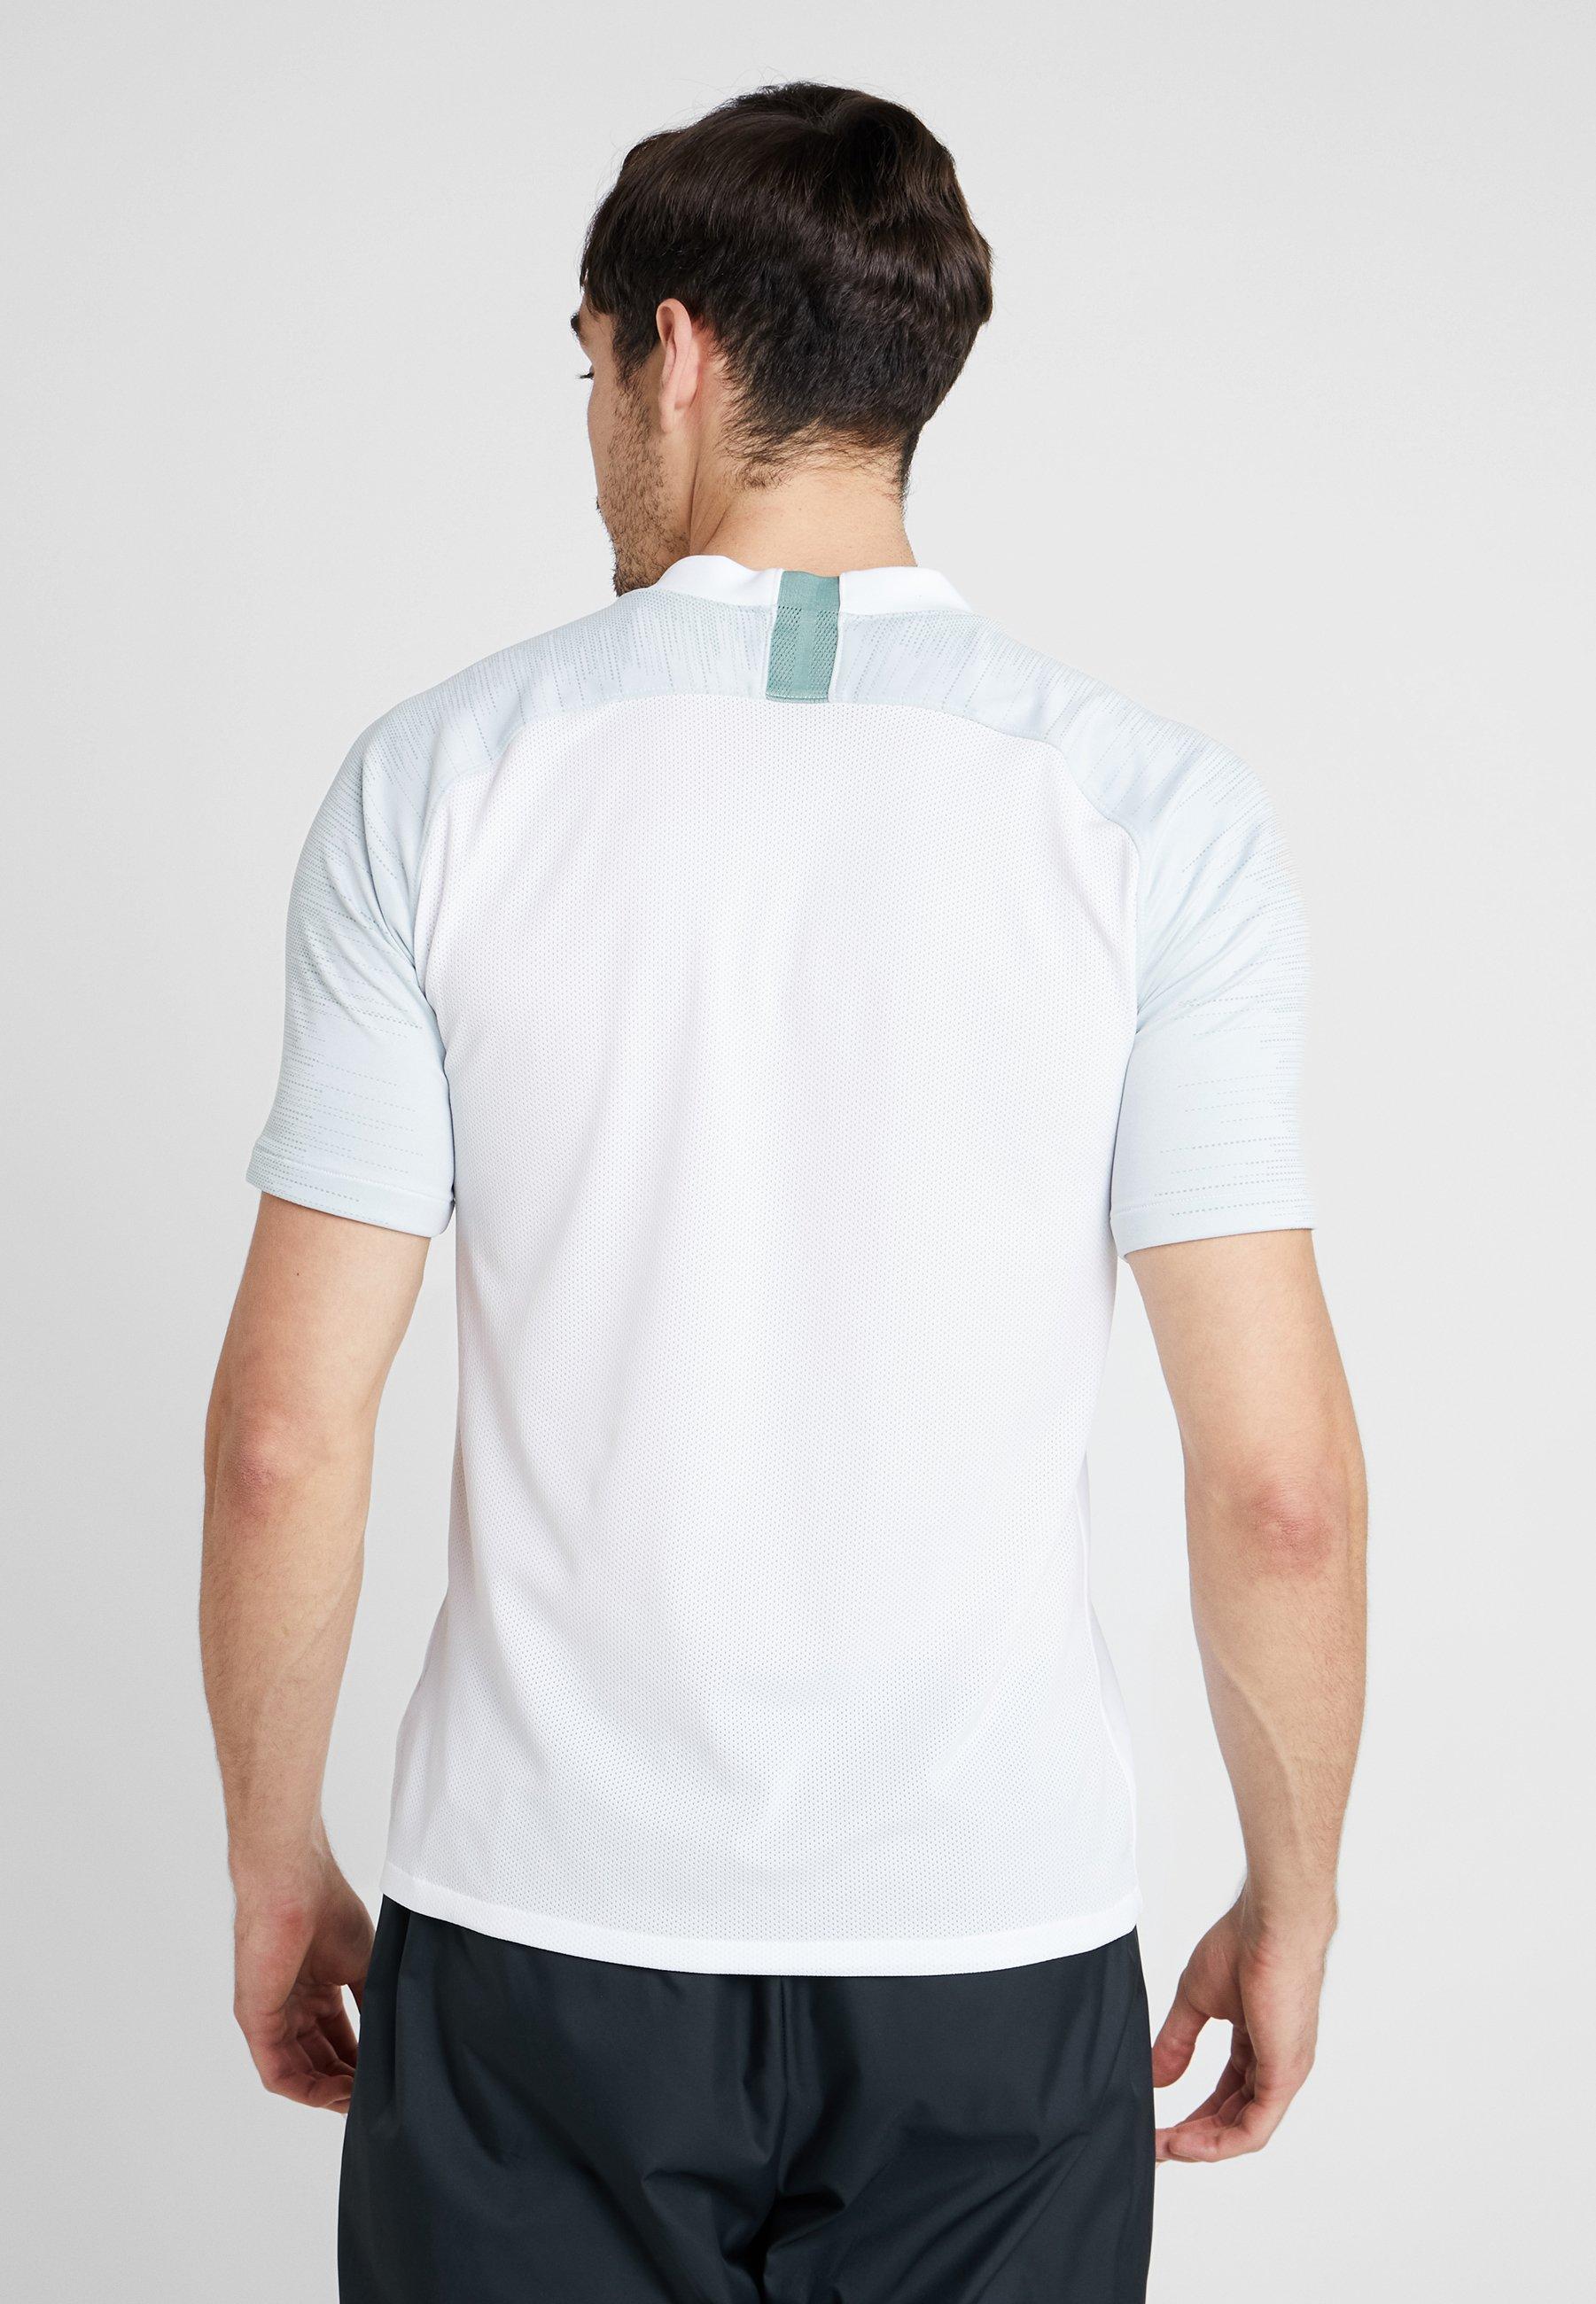 T shirt ImpriméWhite Pine iridescent Nike silver Performance VqpUzMS